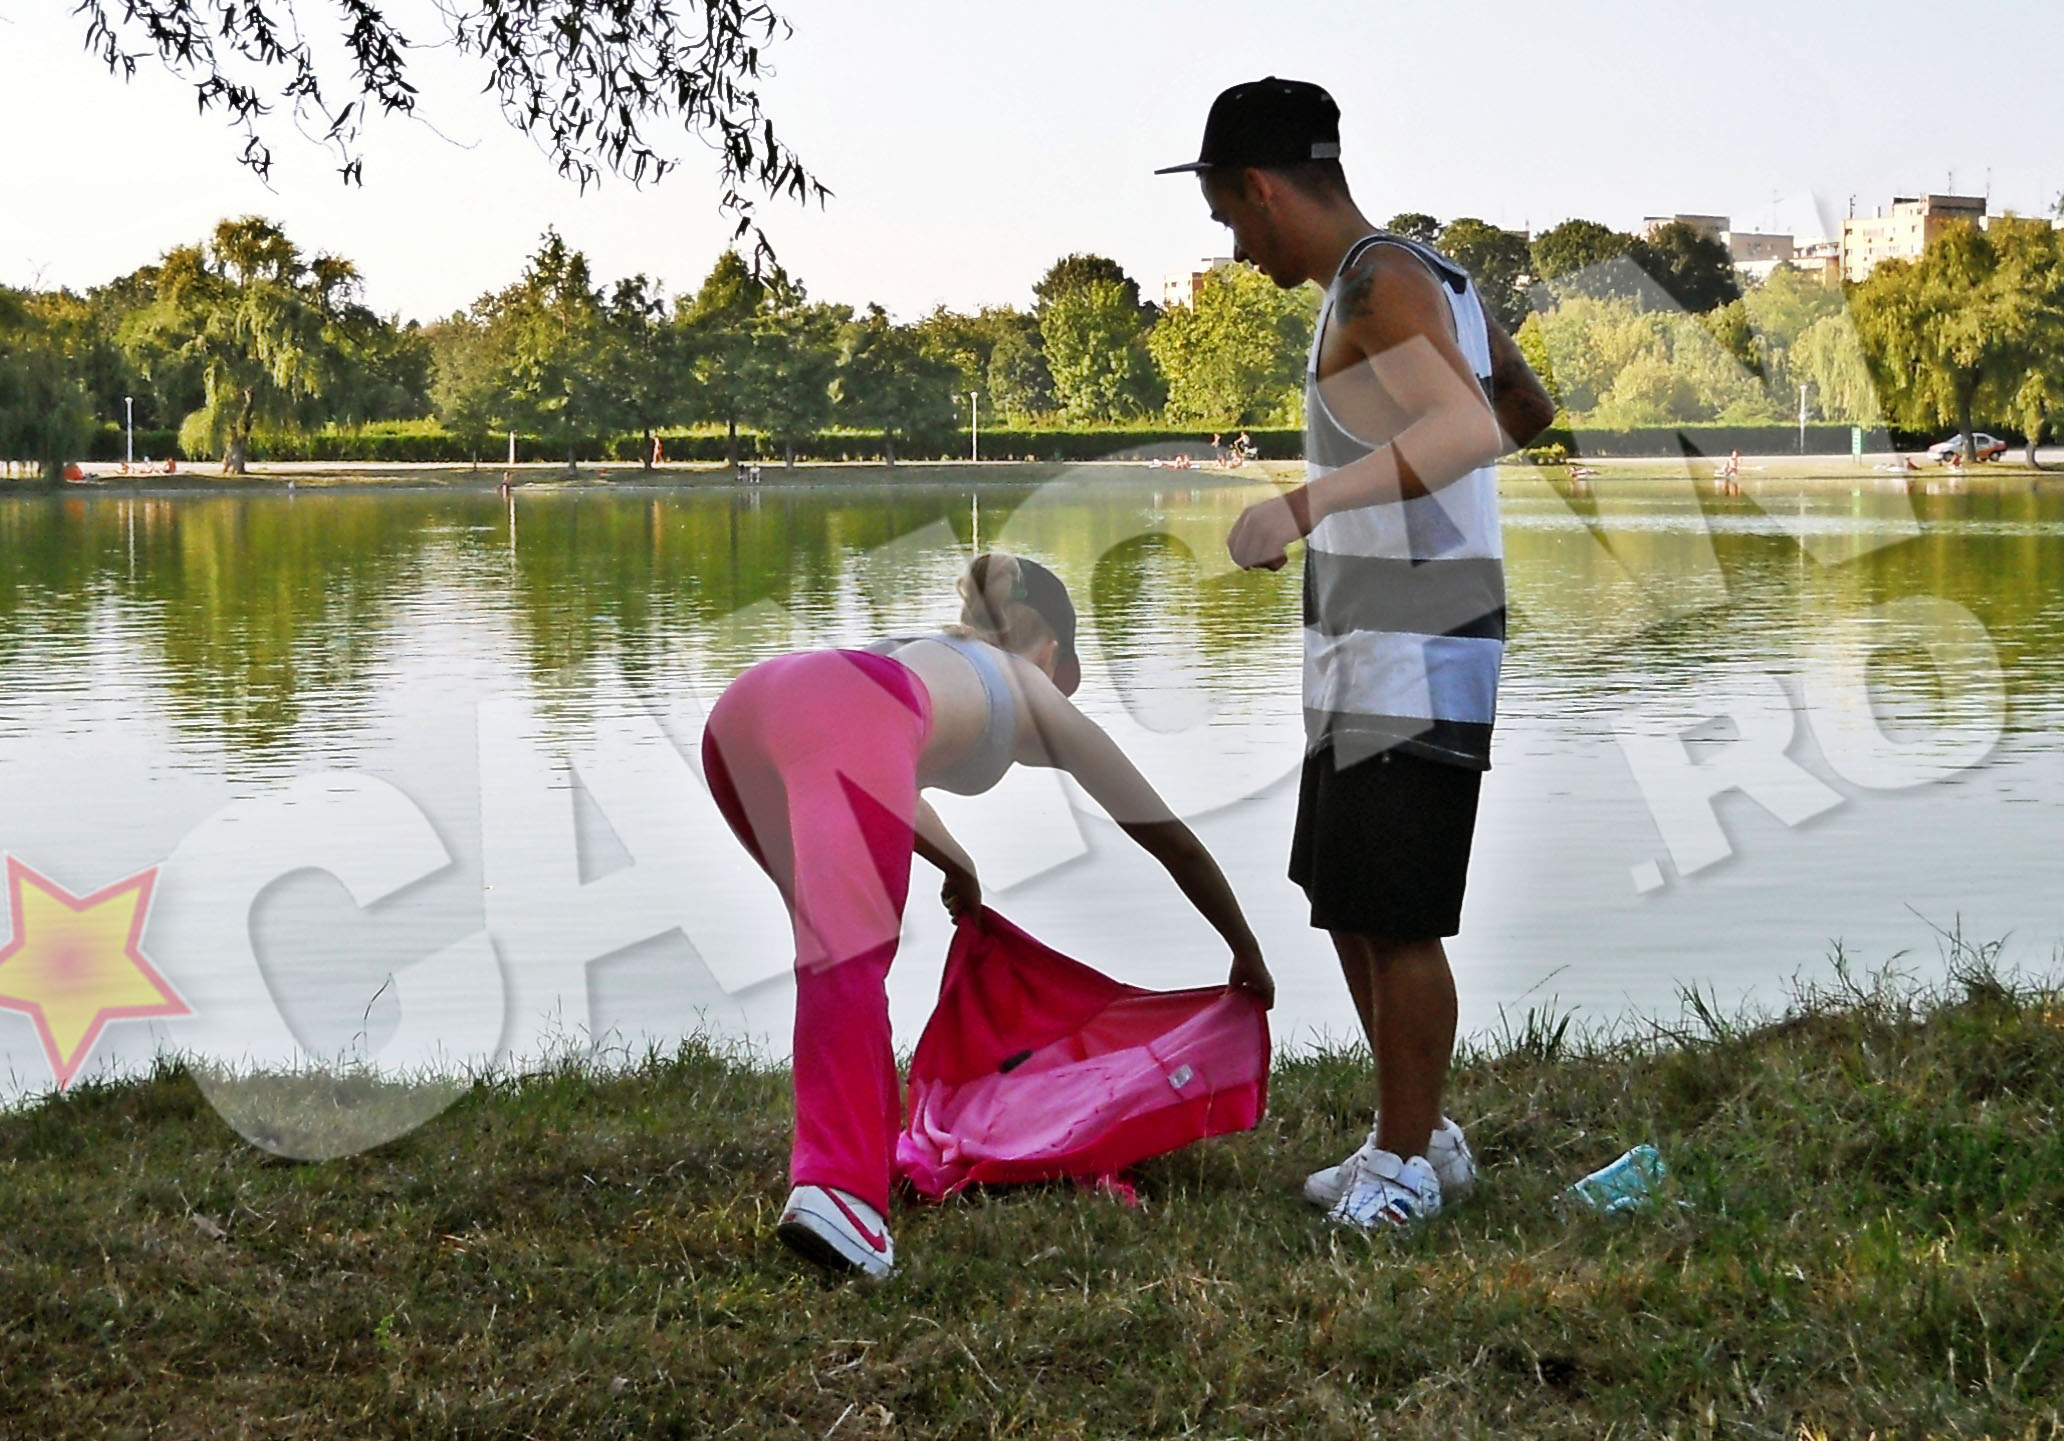 I-a oferit jacheta partenerului ei si l-a invitat sa faca flotari